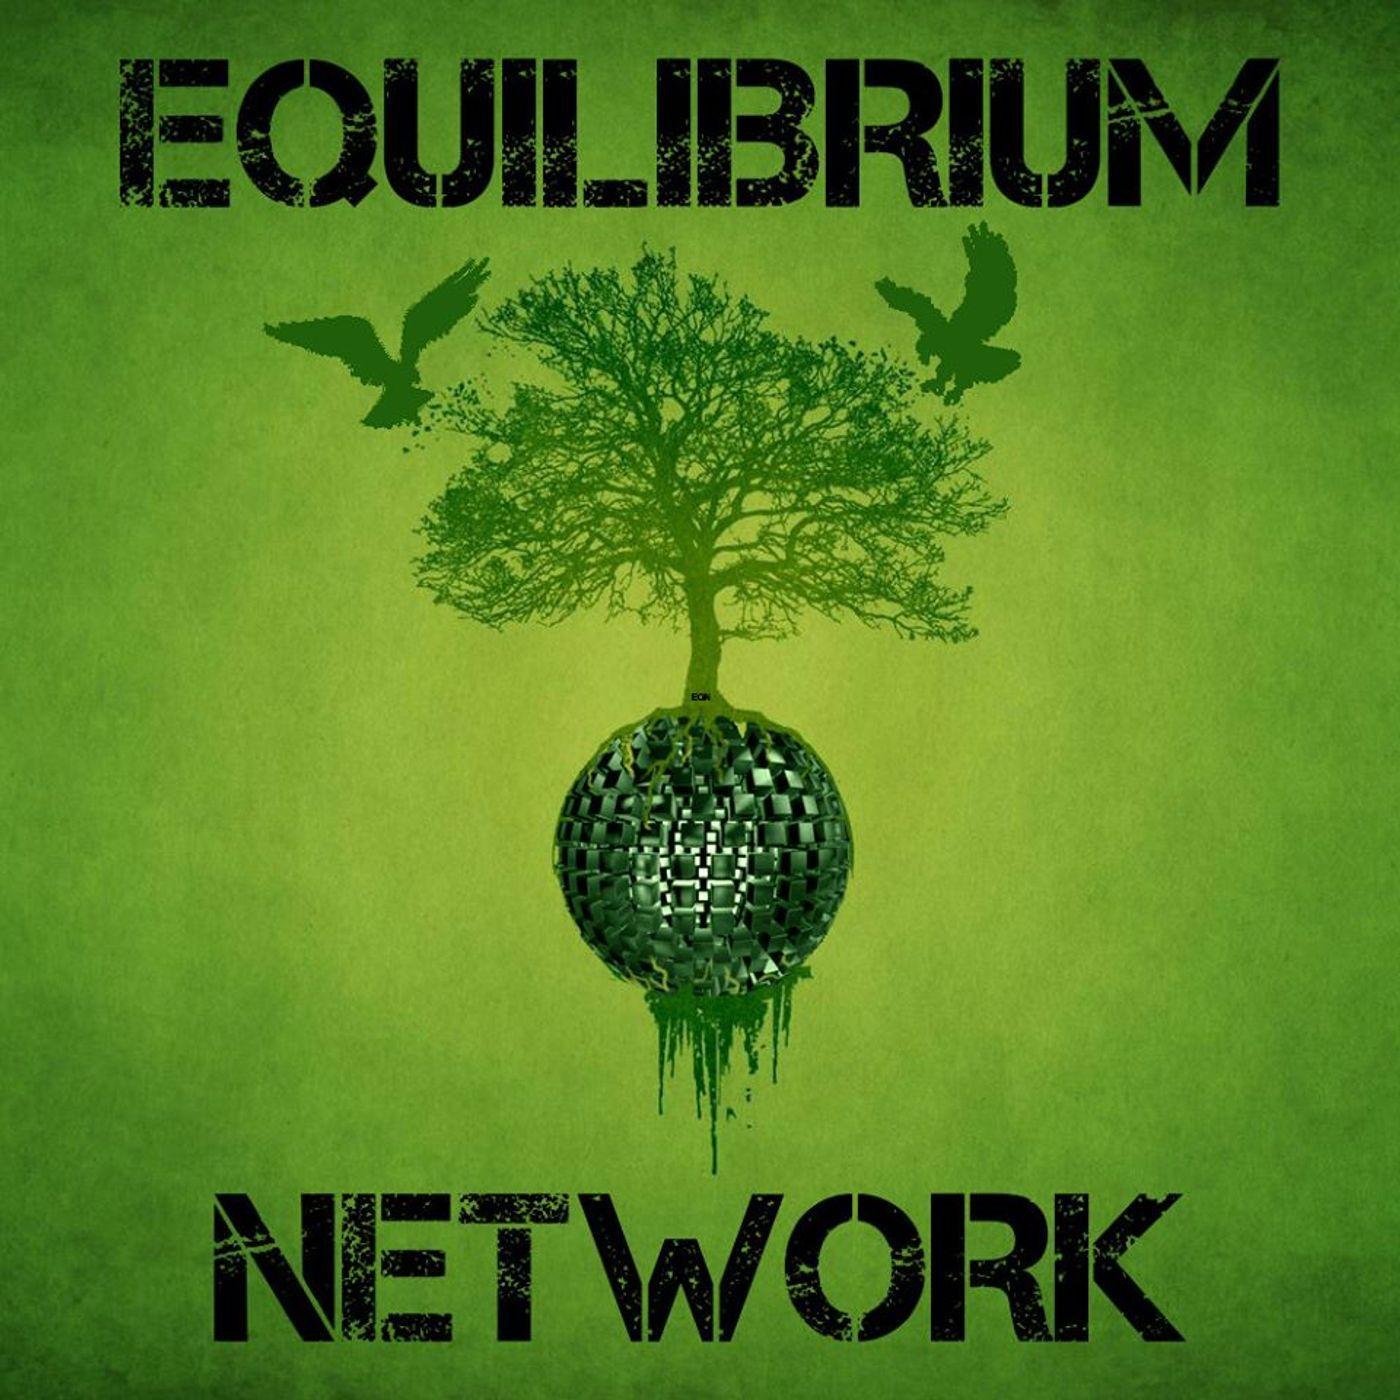 Rivolta fallita in Venezuela - Rubrica n.26 di Equilibrium Network con Geopoliticalcenter.com - Stagione 4 - 2018/19